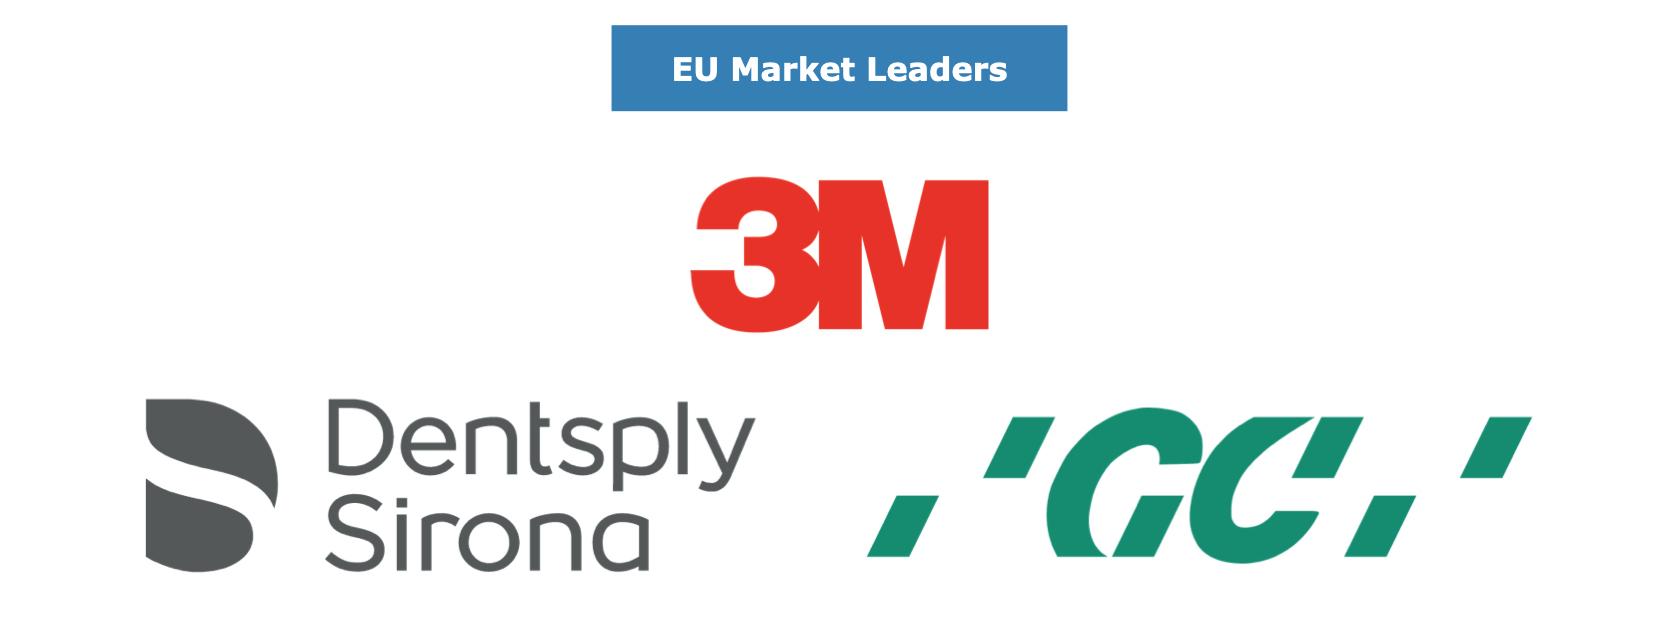 European Dental Materials Market Leaders